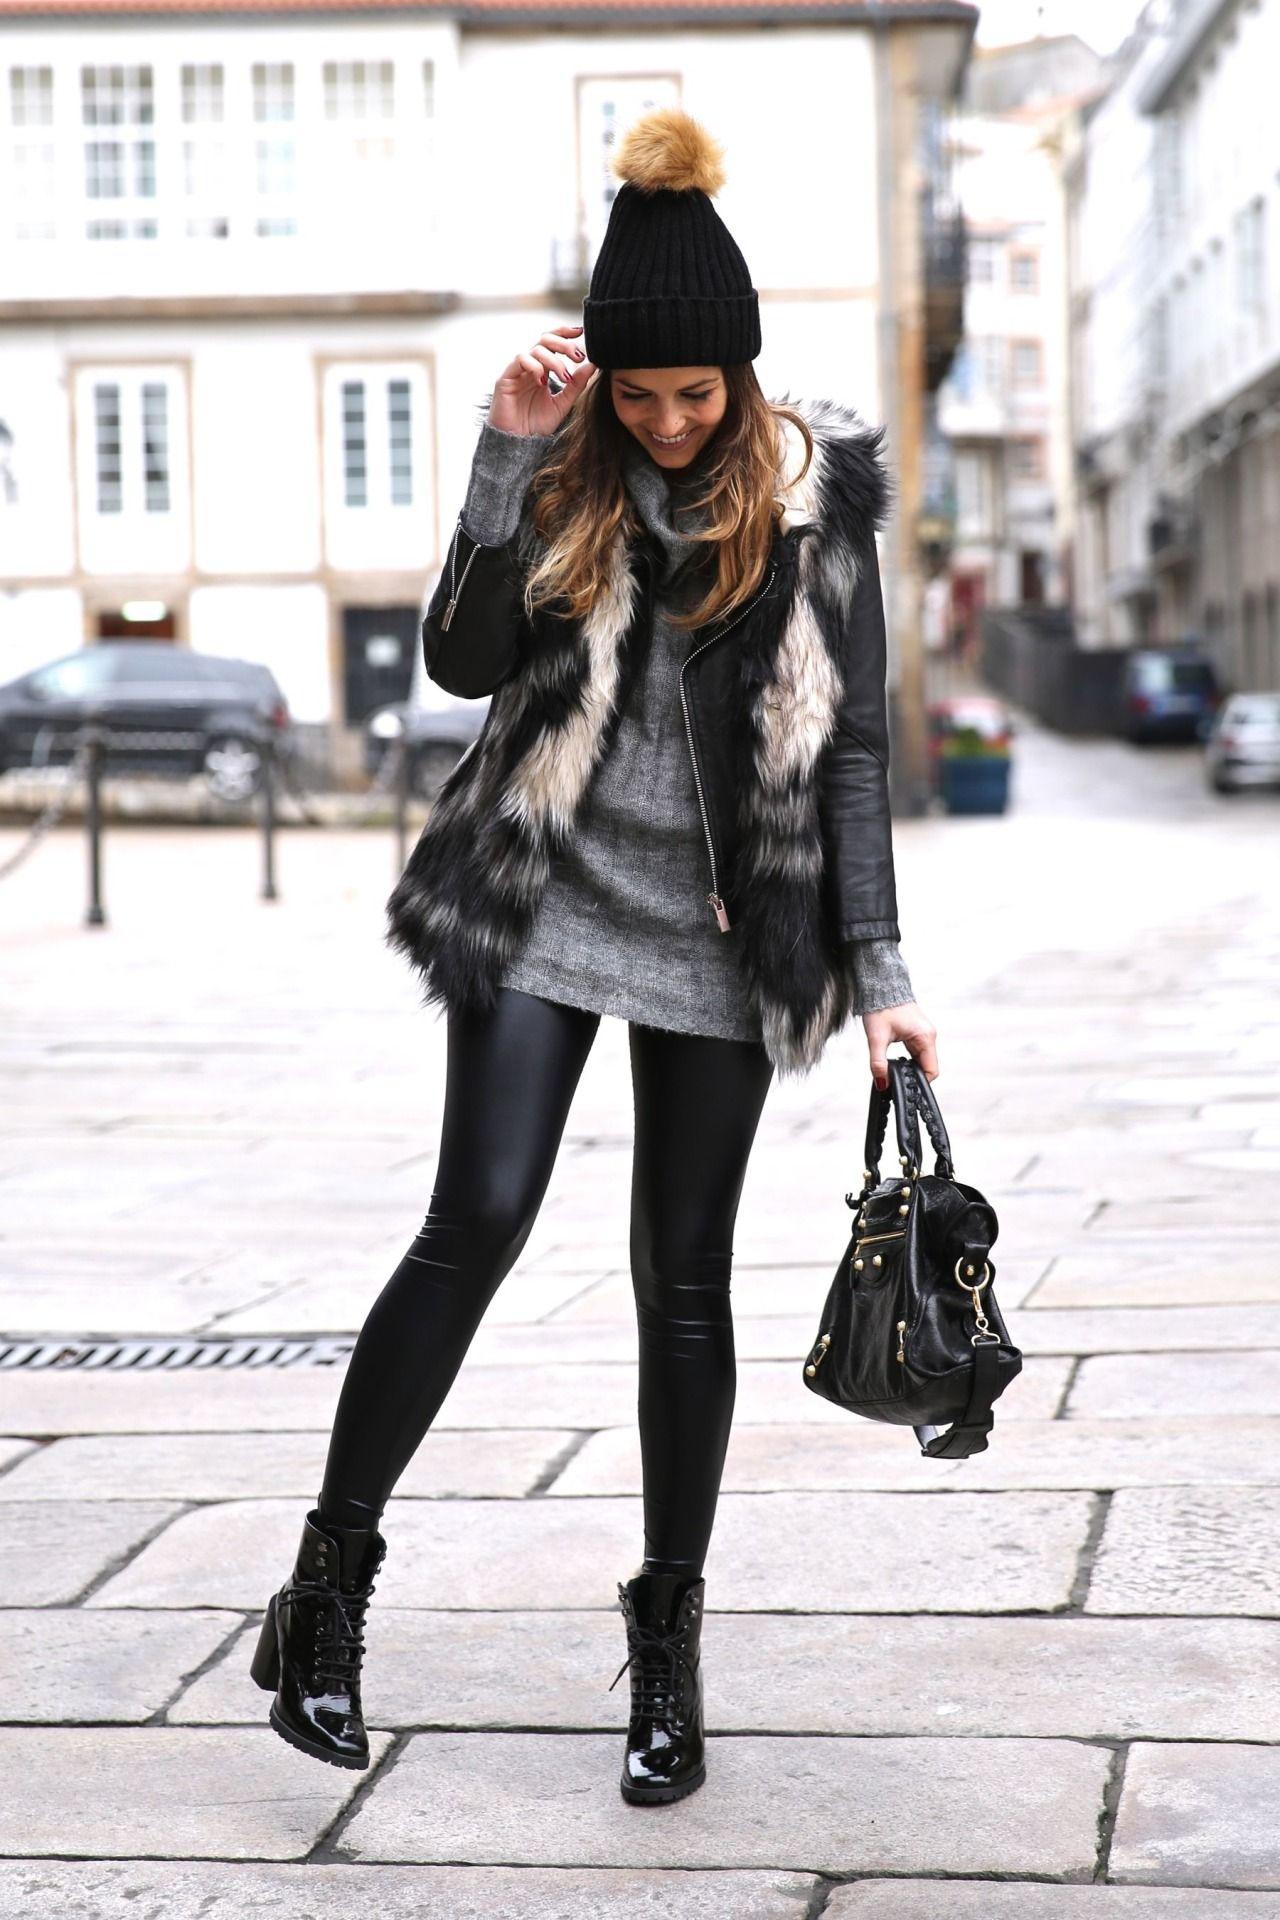 pinkatrine a. on fall/winter inspiration | pinterest | winter